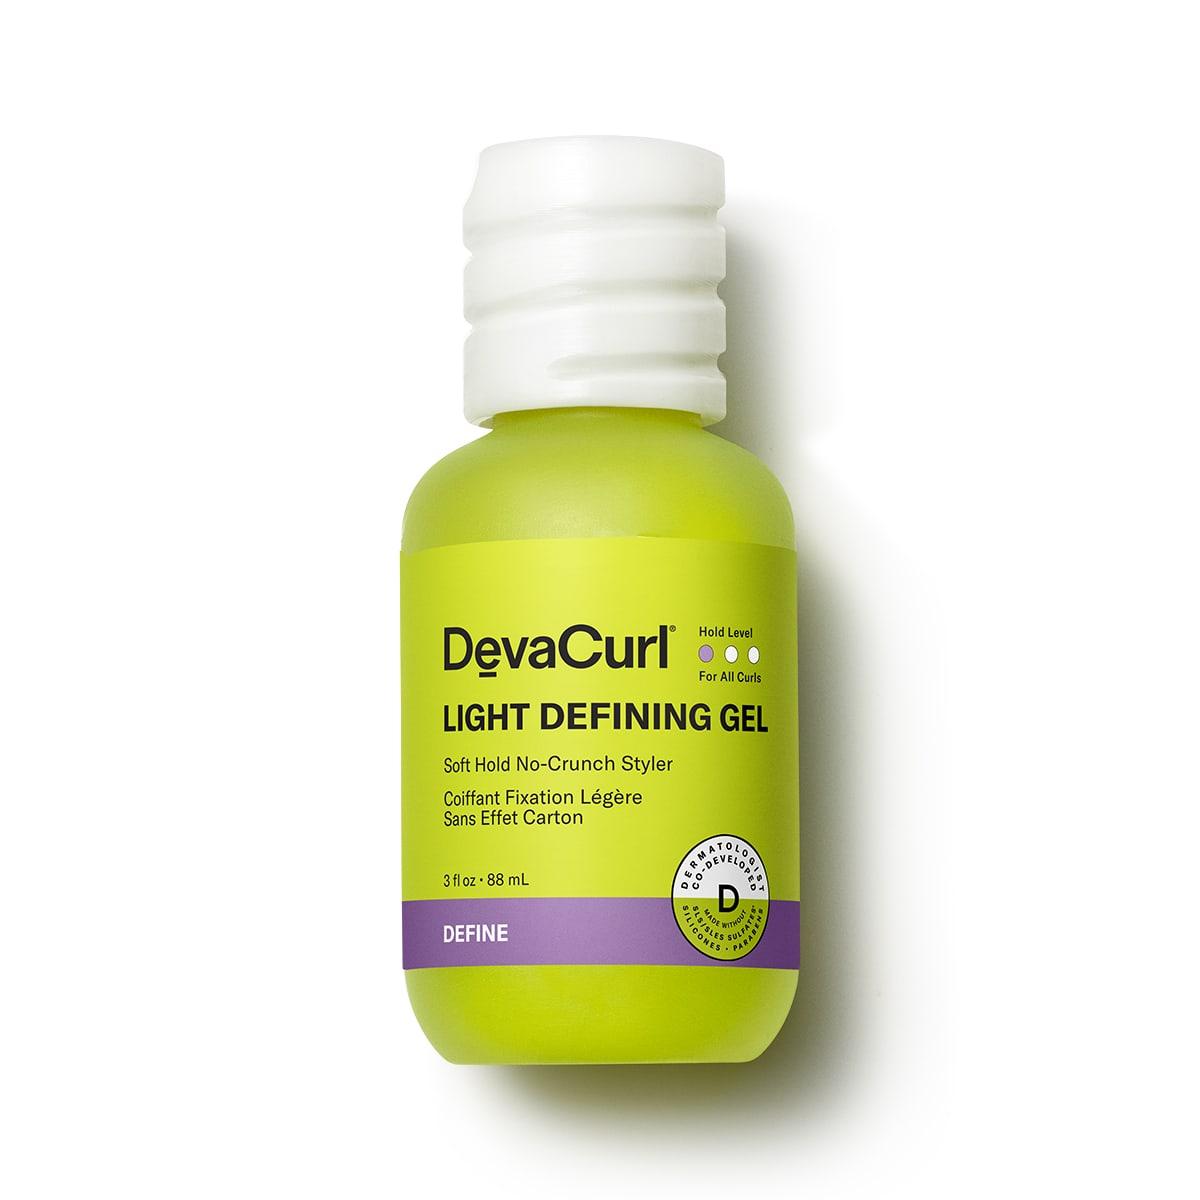 Light Defining Gel 3 oz Bottle